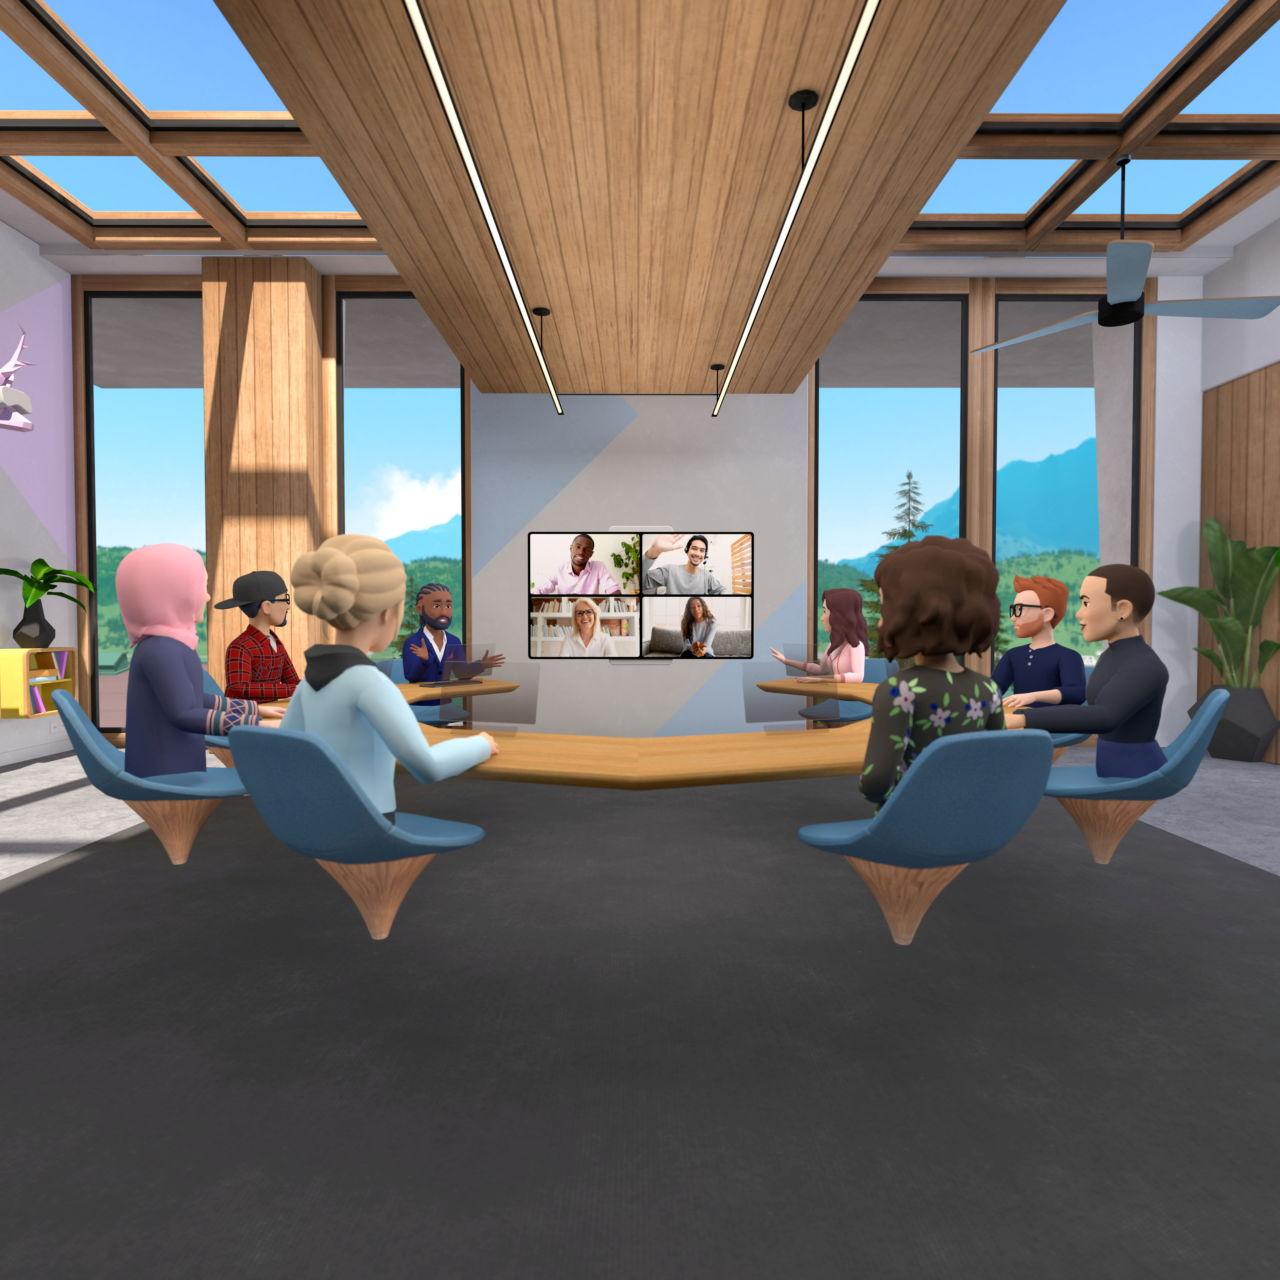 FBが公開した、リモートワーク用の新たな仮想現実(VR)アプリ「ホライゾン・ワークルームズ」の試験版